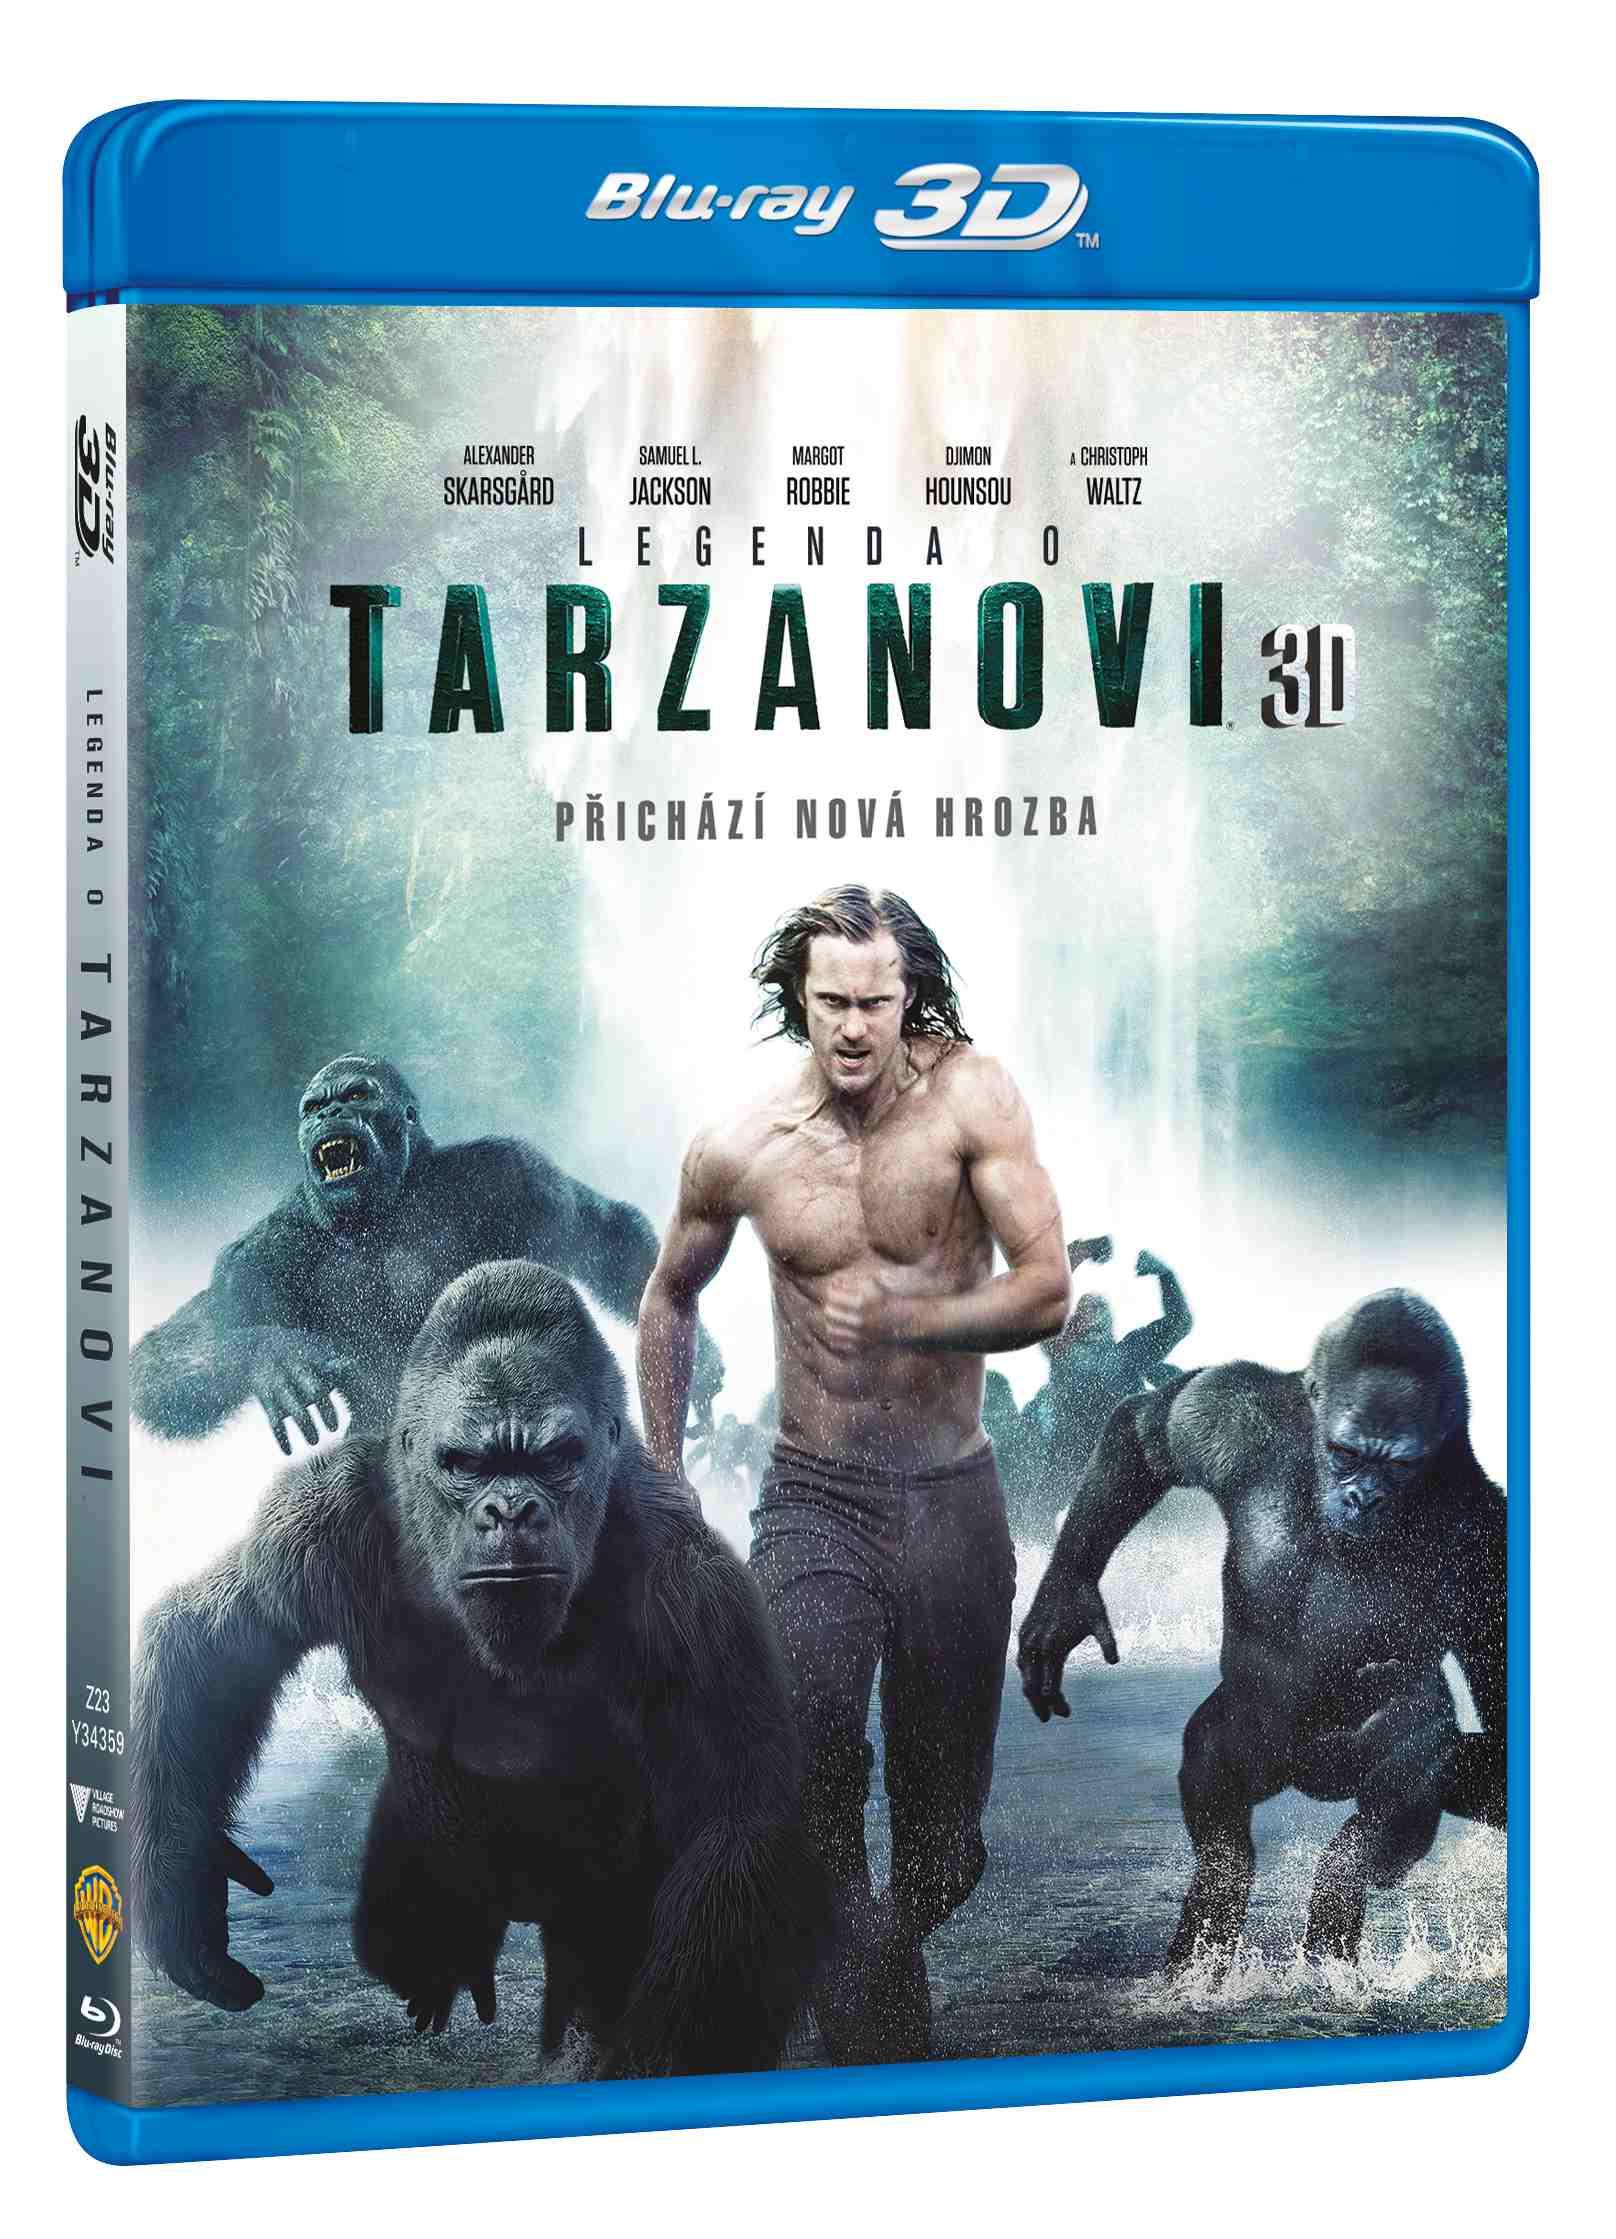 LEGENDA O TARZANOVI - Blu-ray 3D + 2D